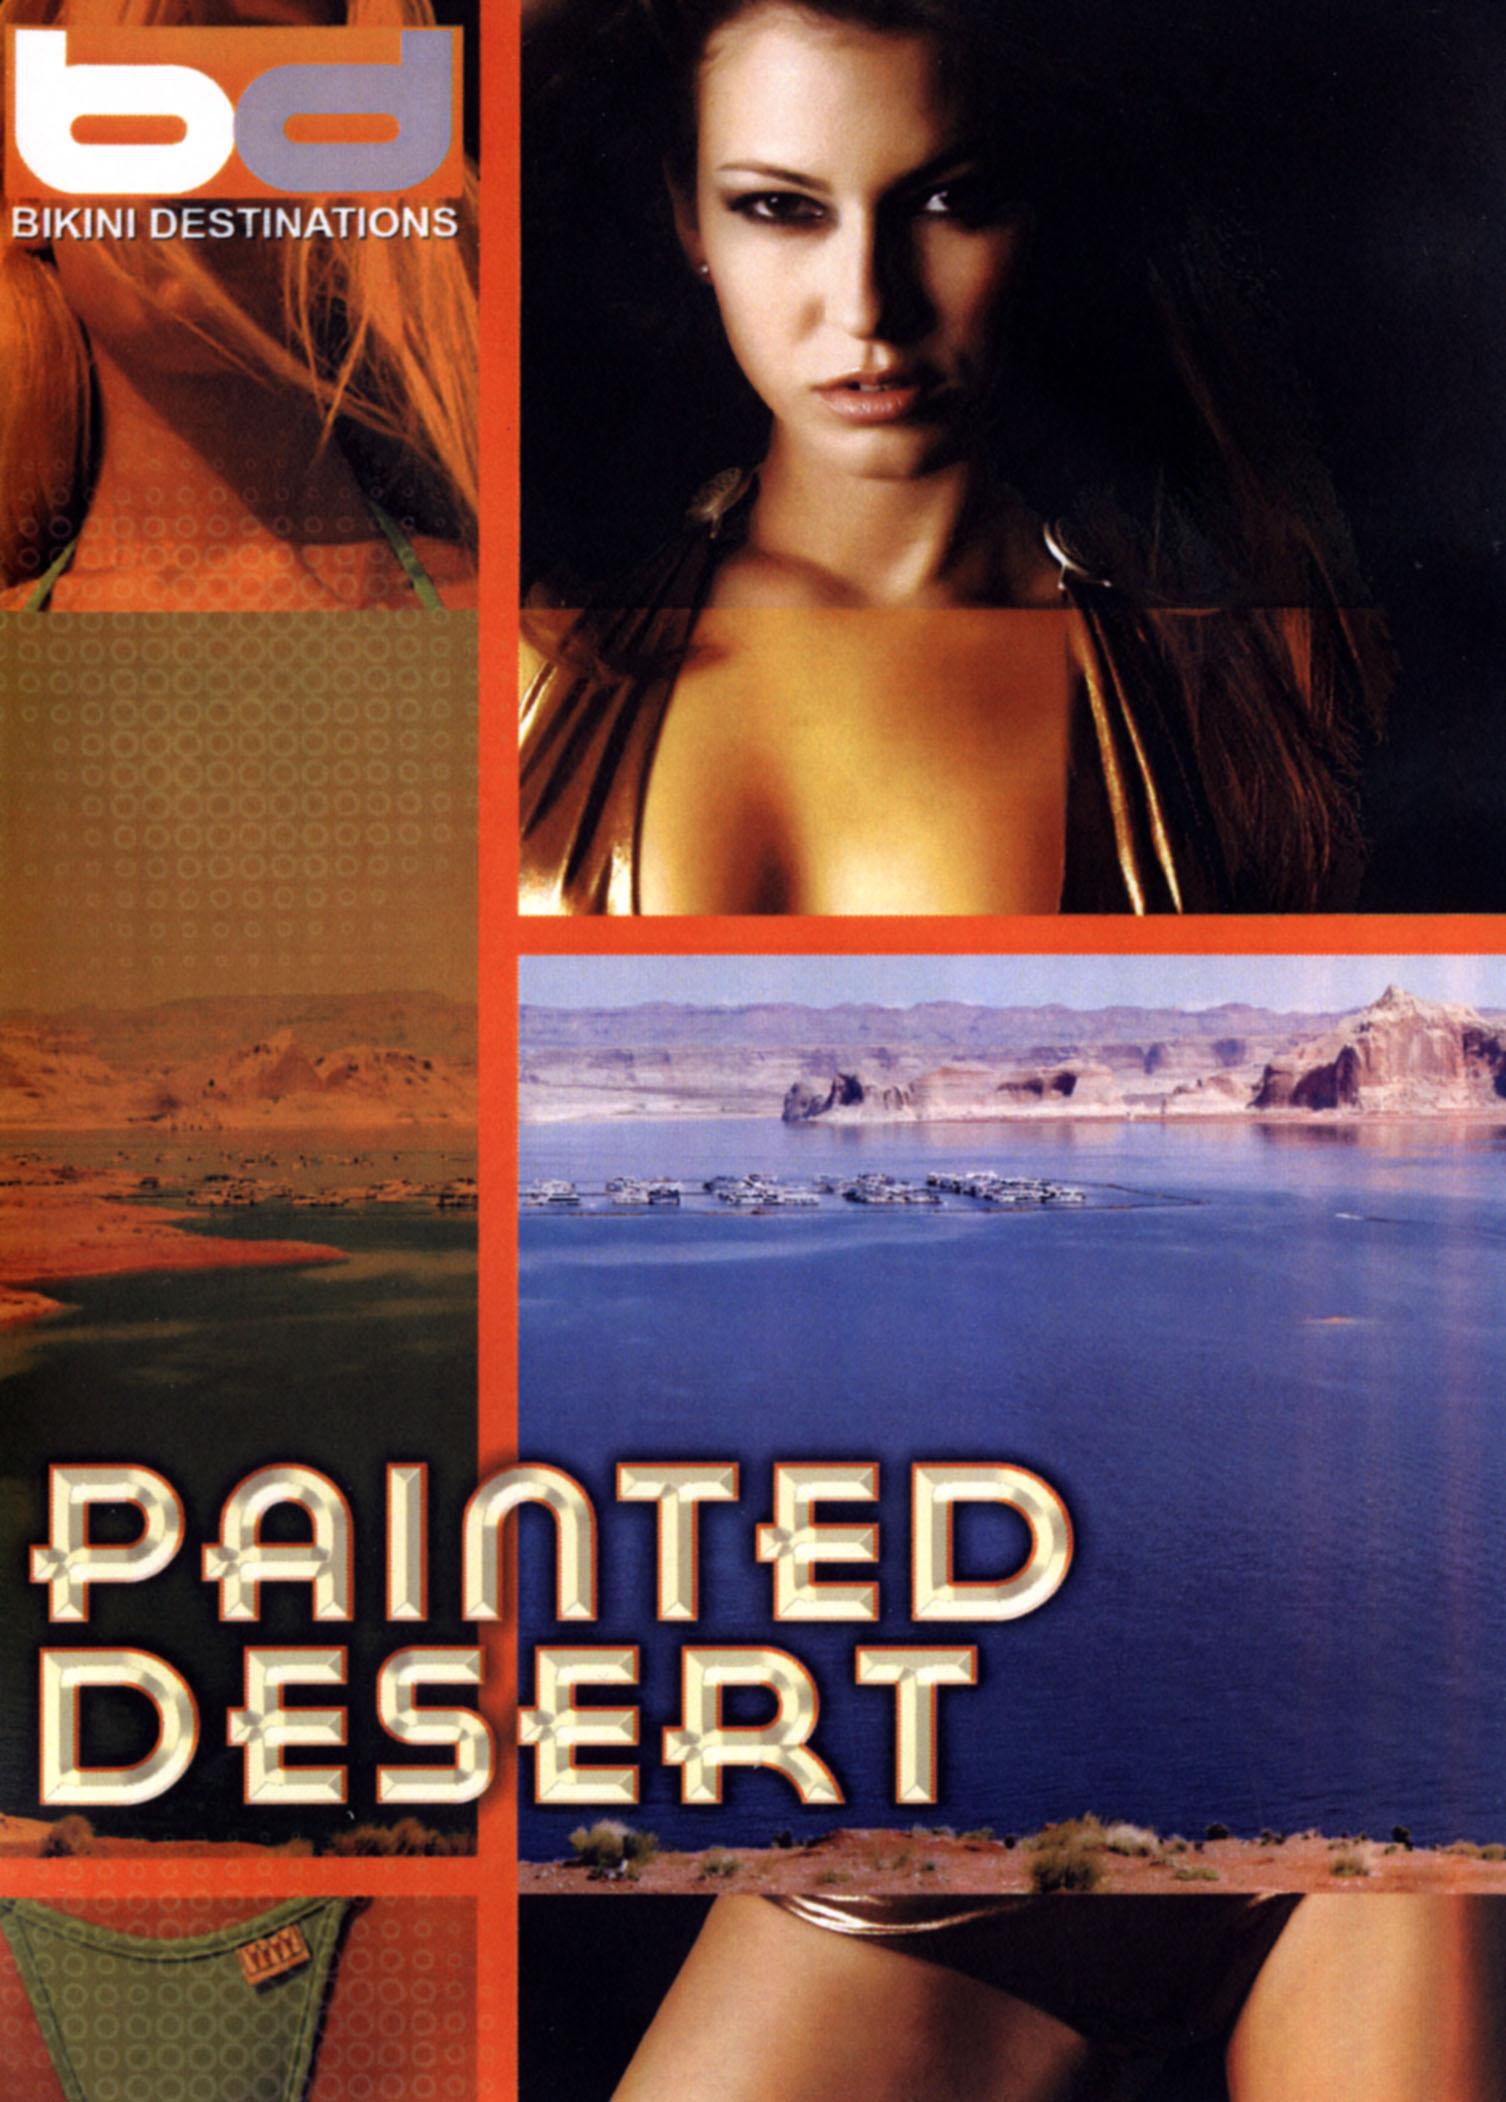 Bikini Destinations: Painted Desert